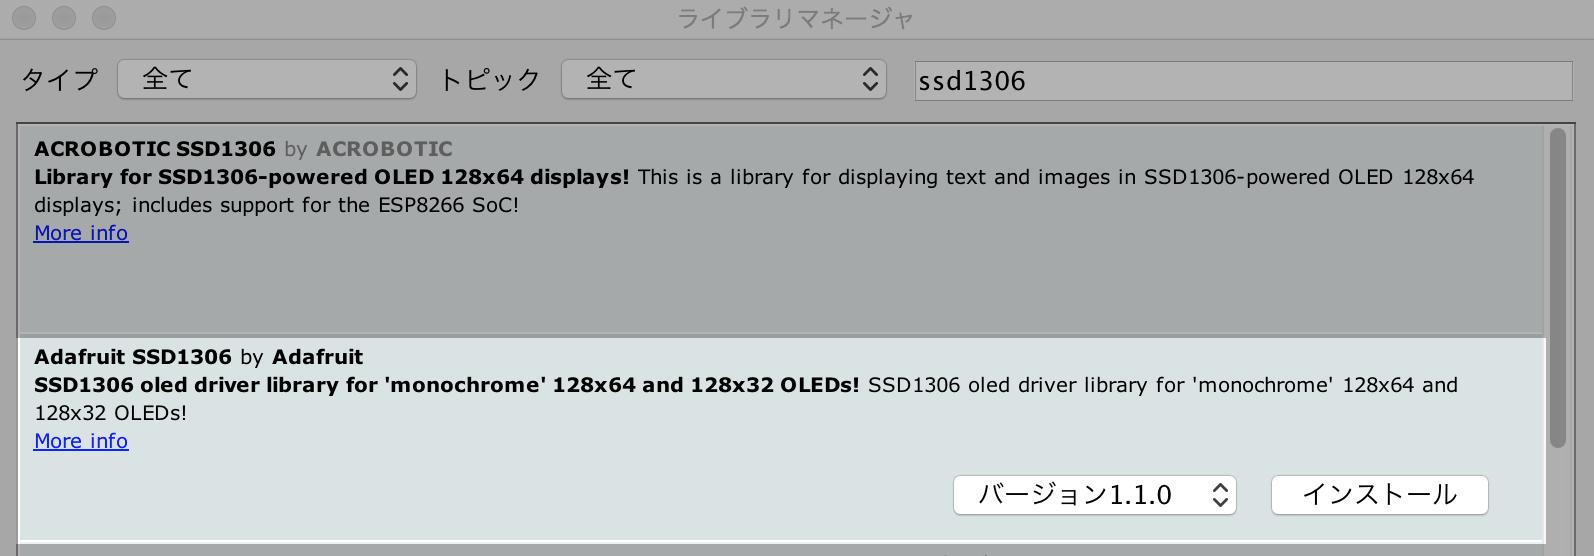 Adafruit SSD1306のインストール